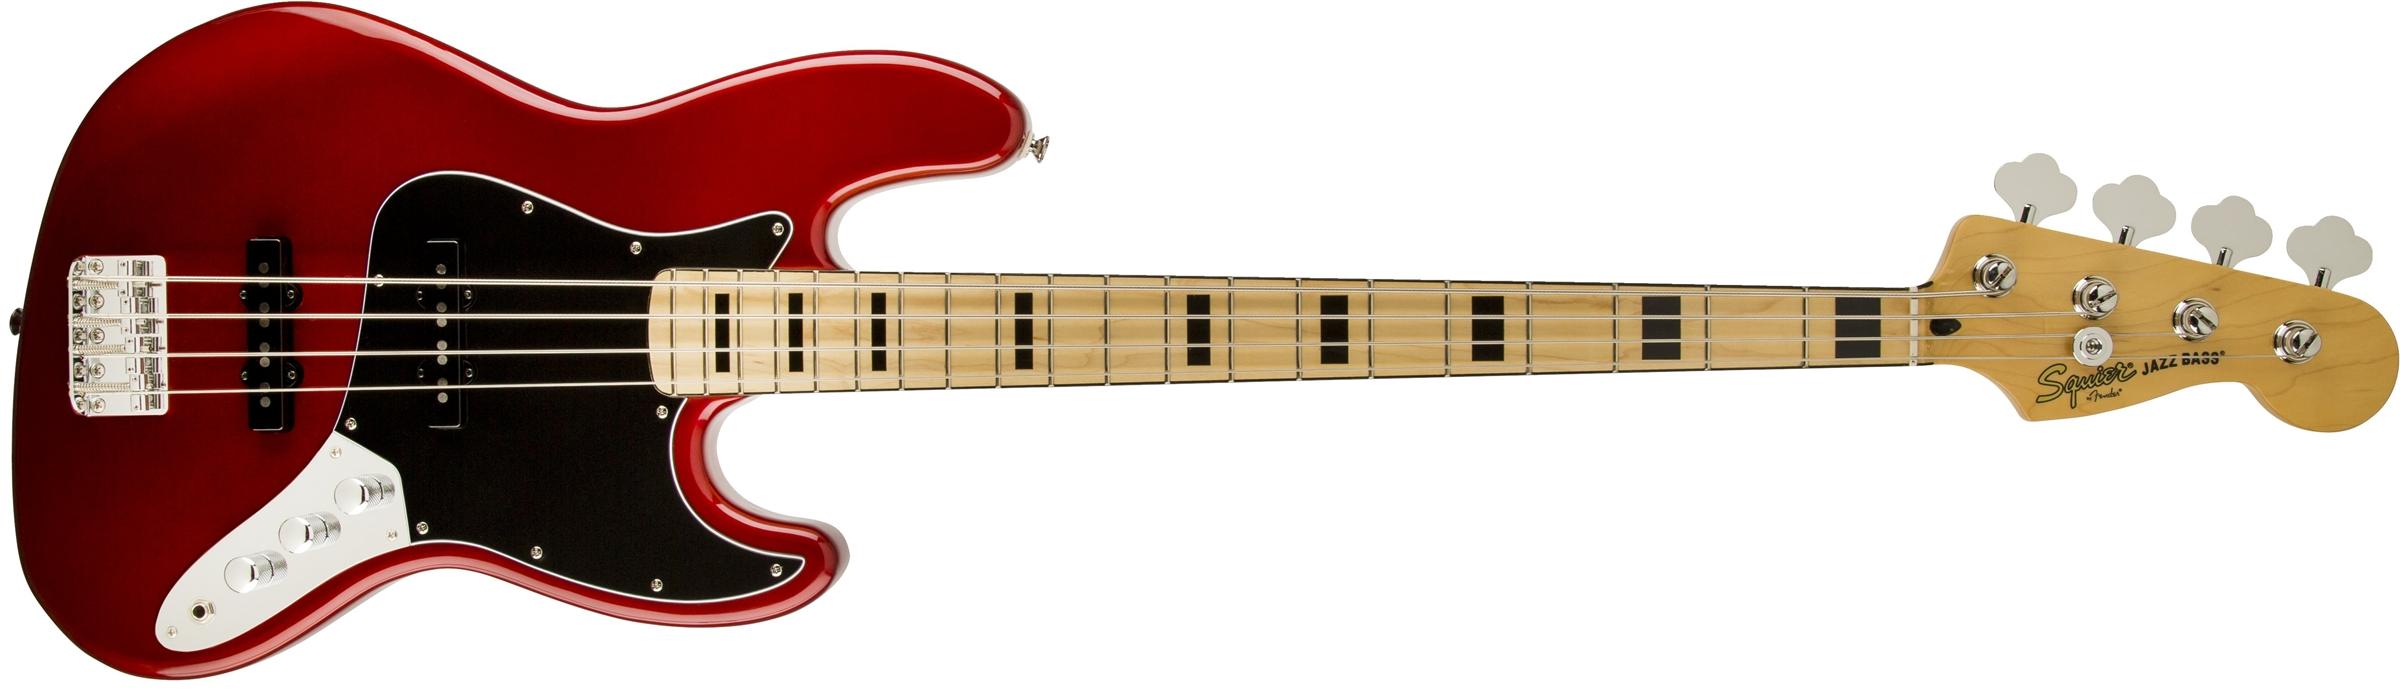 Vintage Modified Jazz BassR 70s